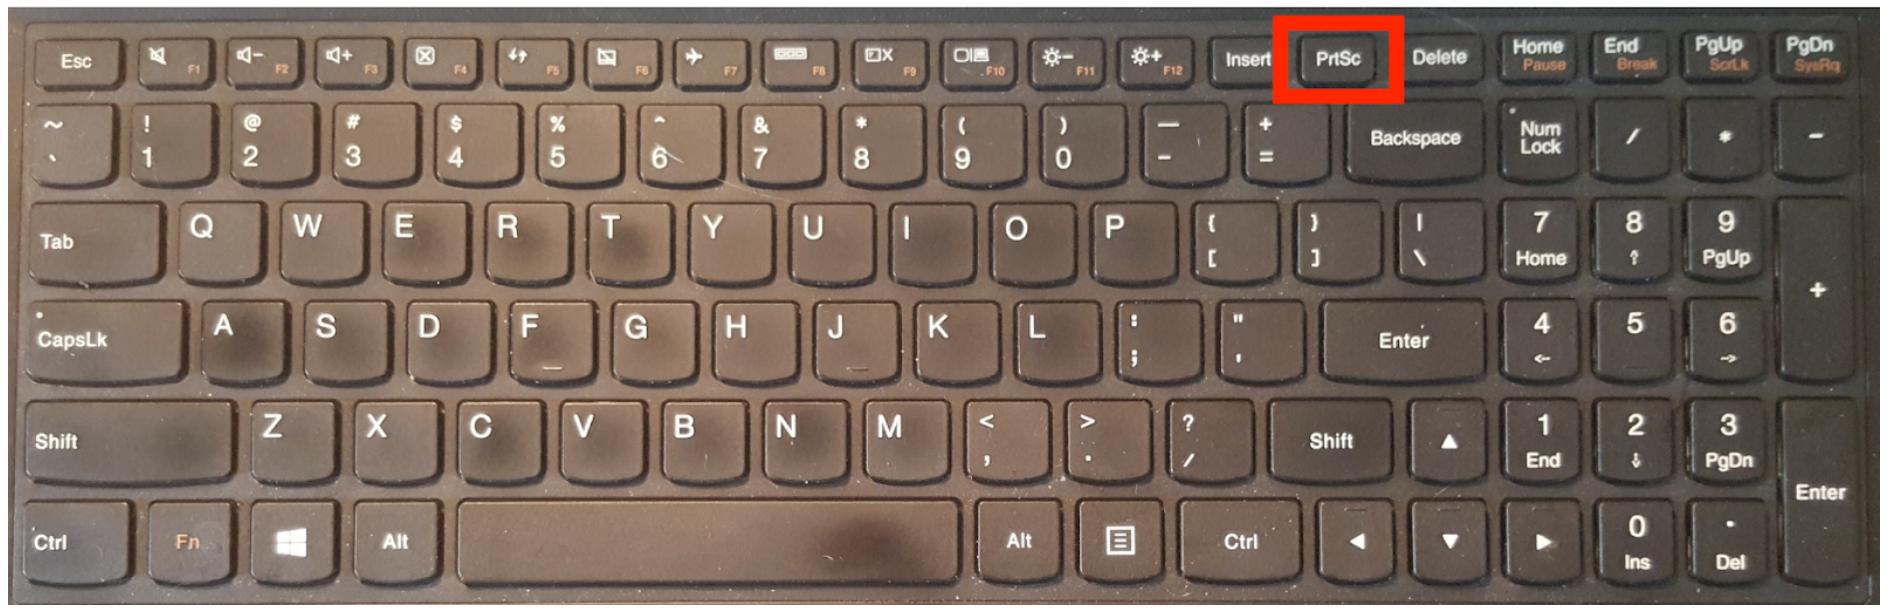 How to Screenshot on Windows - Take Screenshots in Windows 11